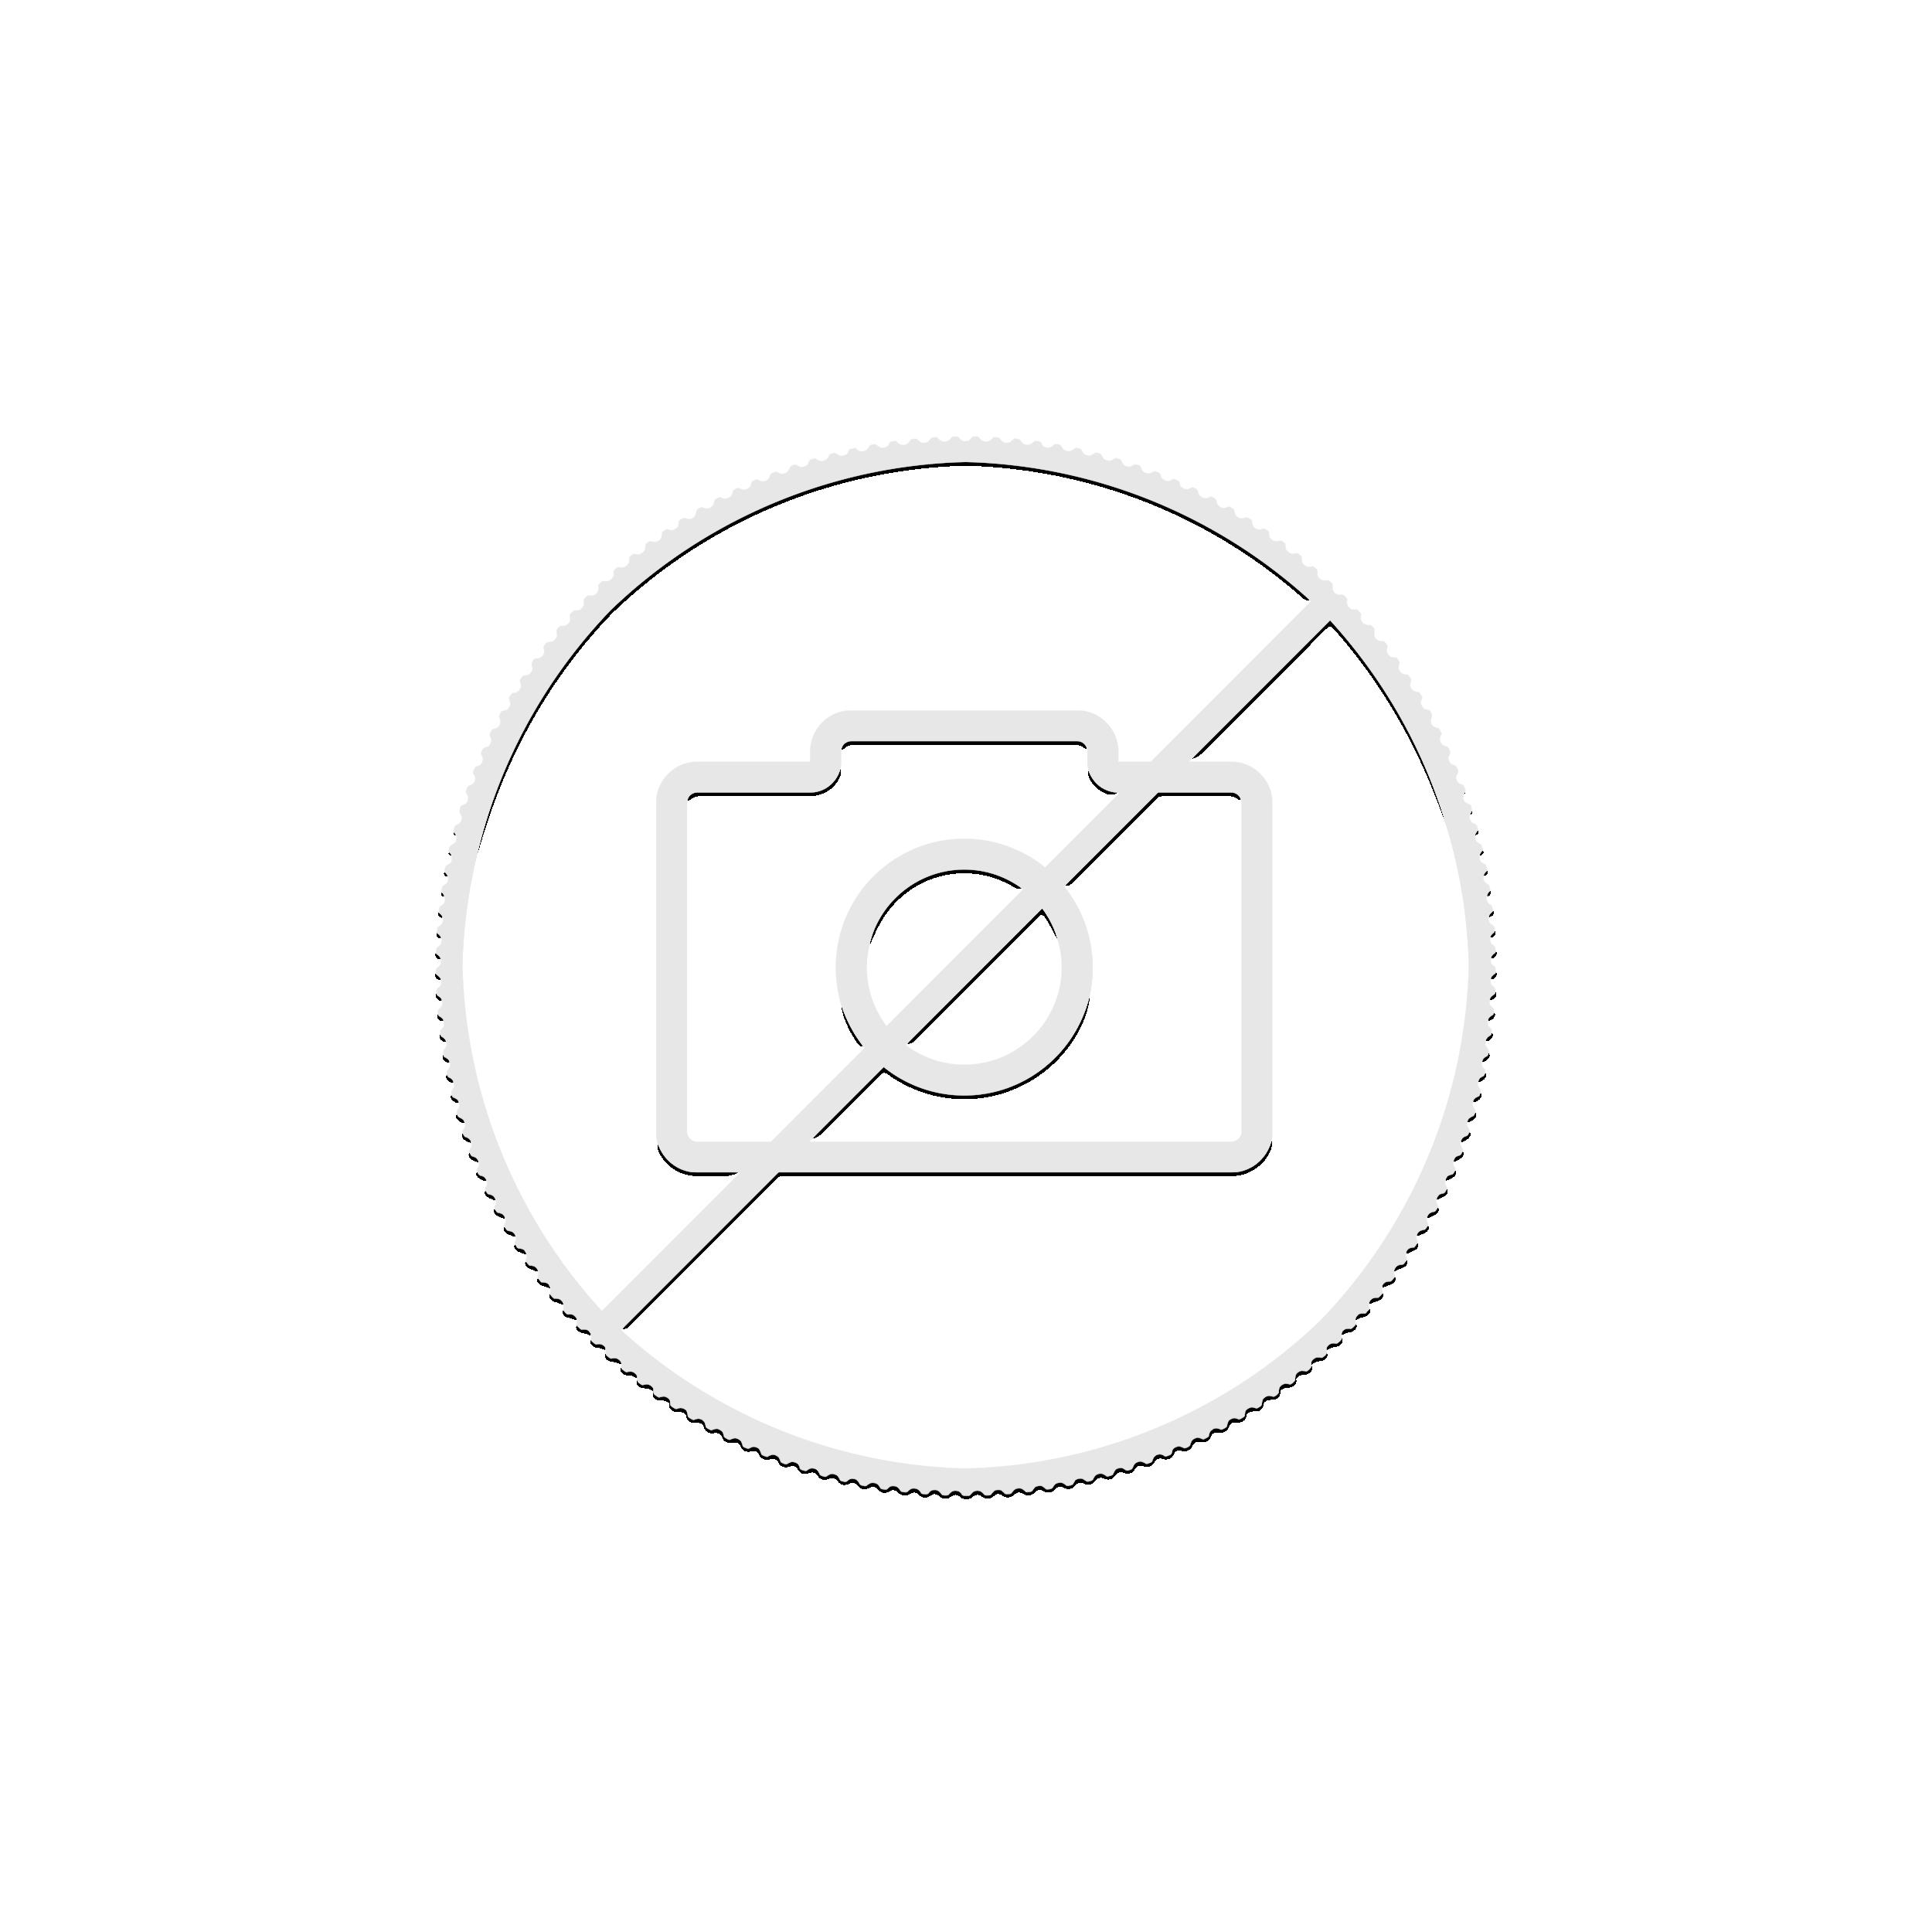 1 Kilo silver coin Kookaburra 2017